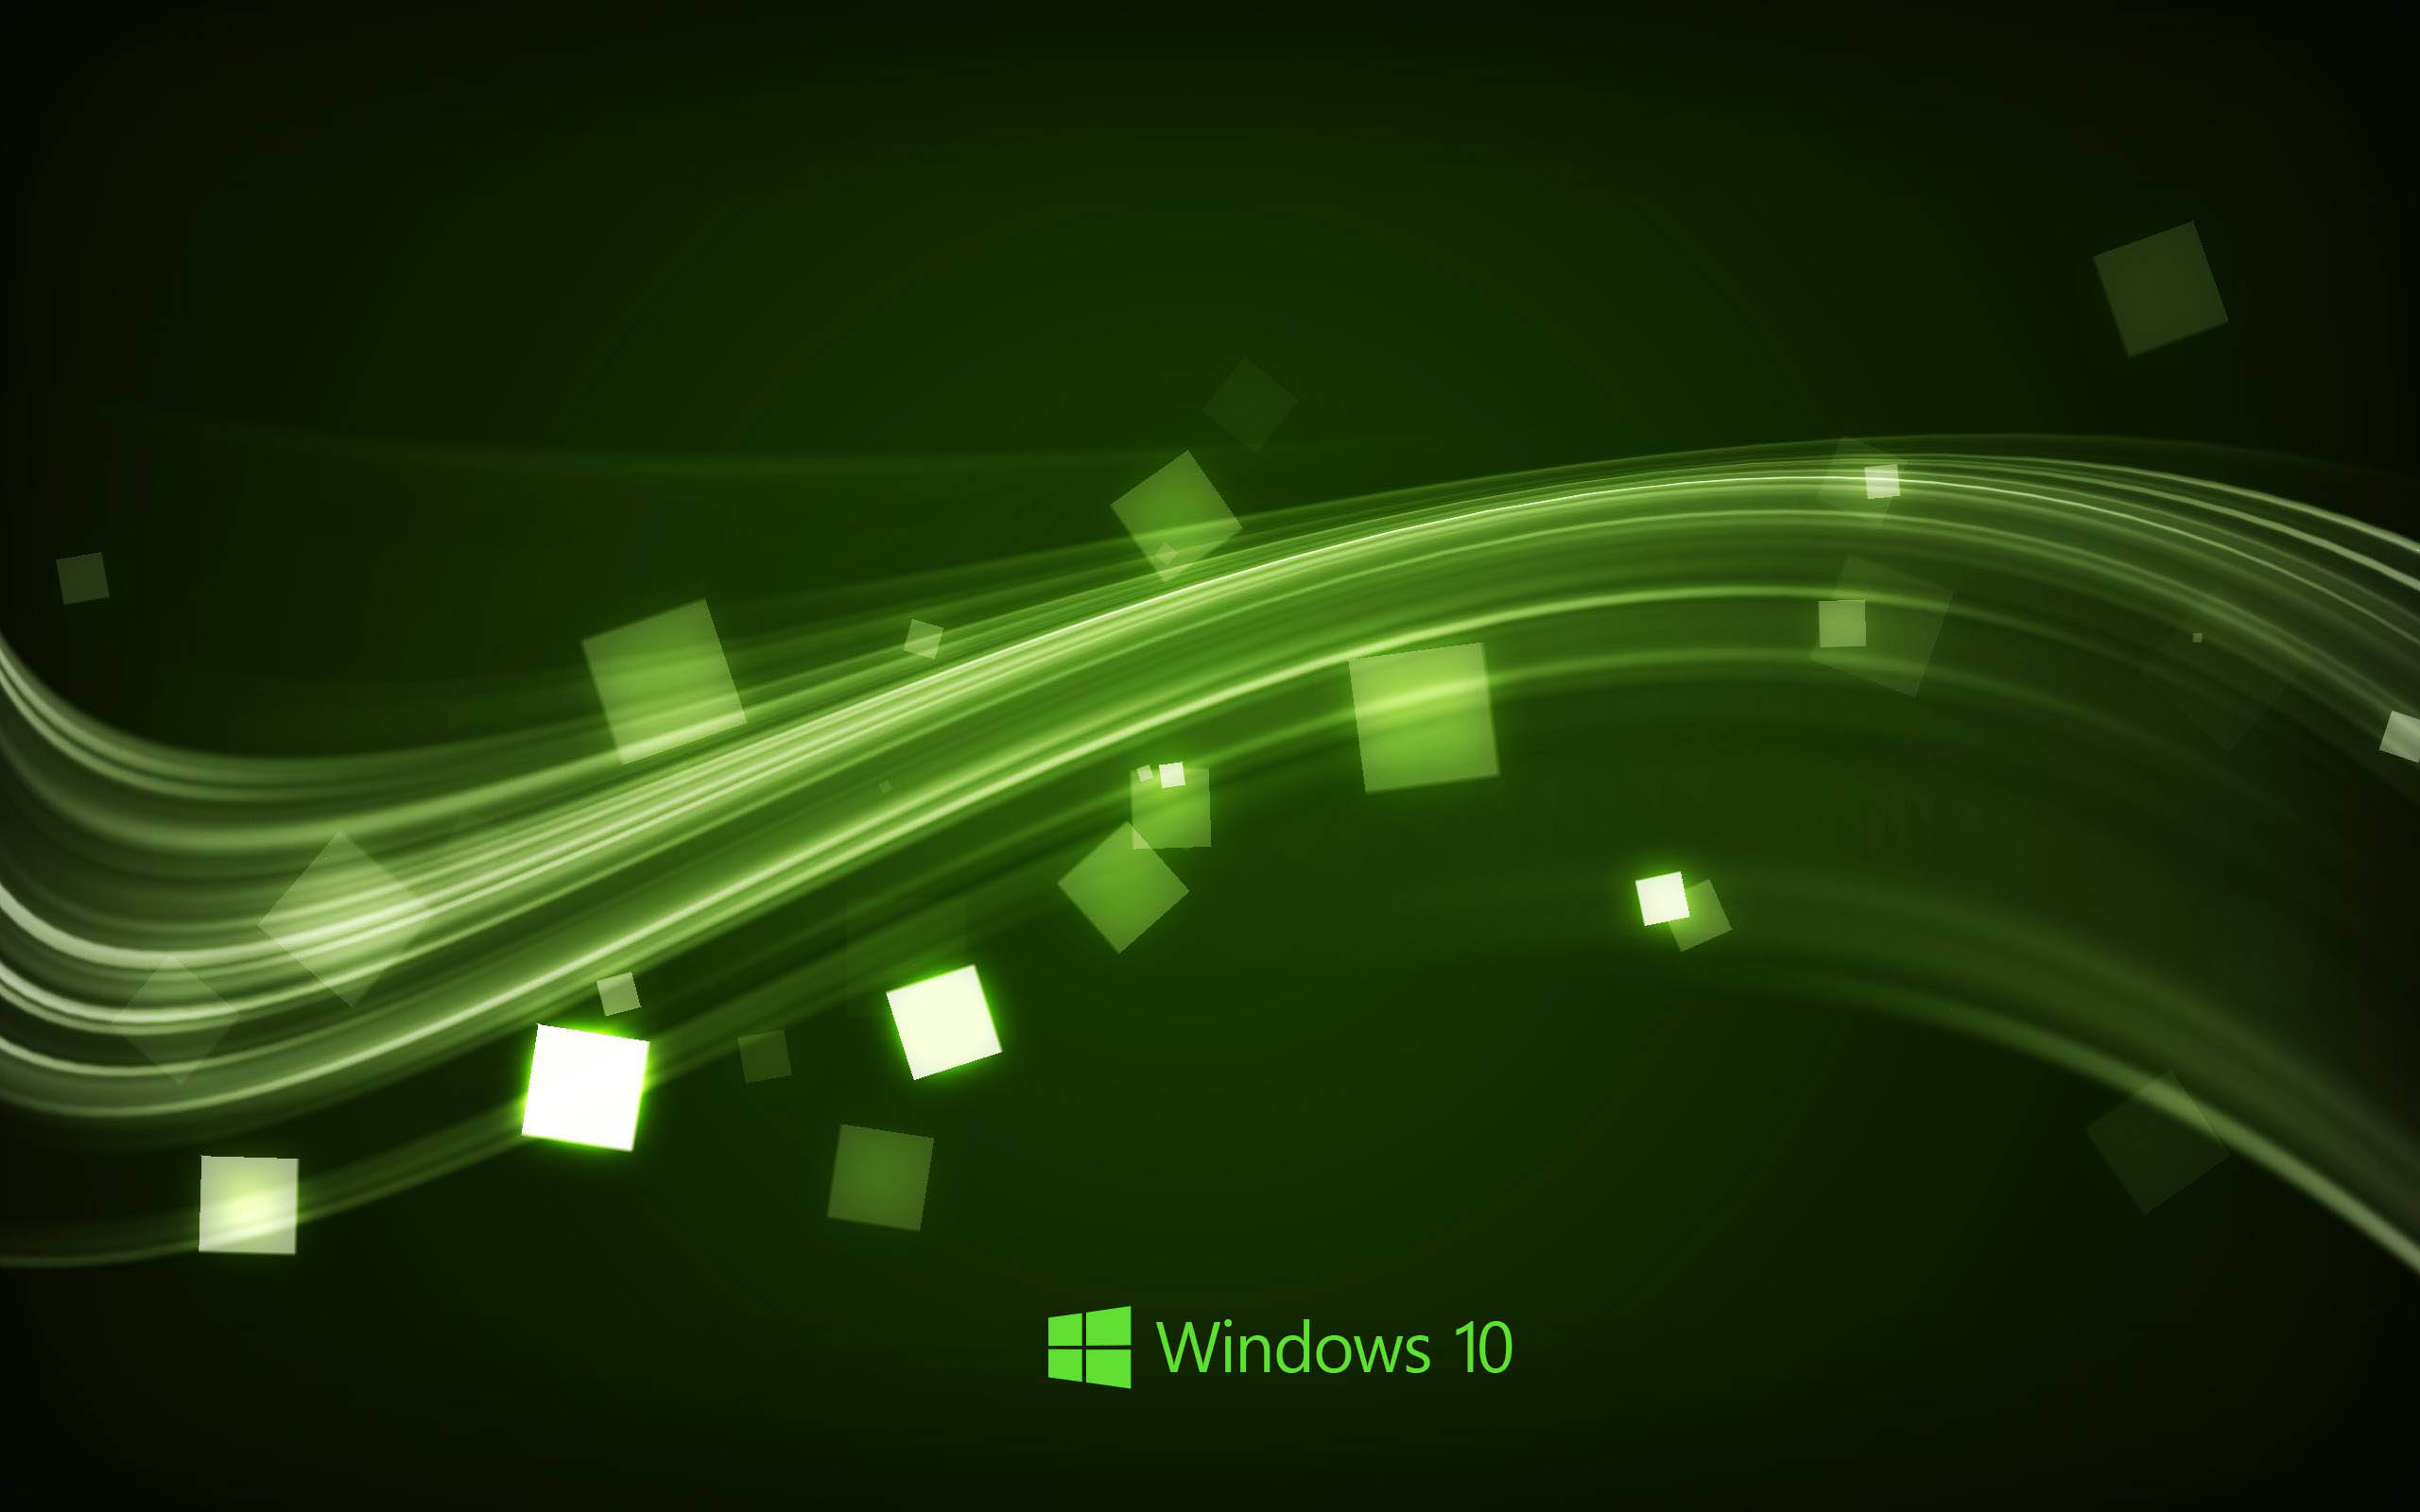 windows 10 high definition wallpaper - wallpapersafari